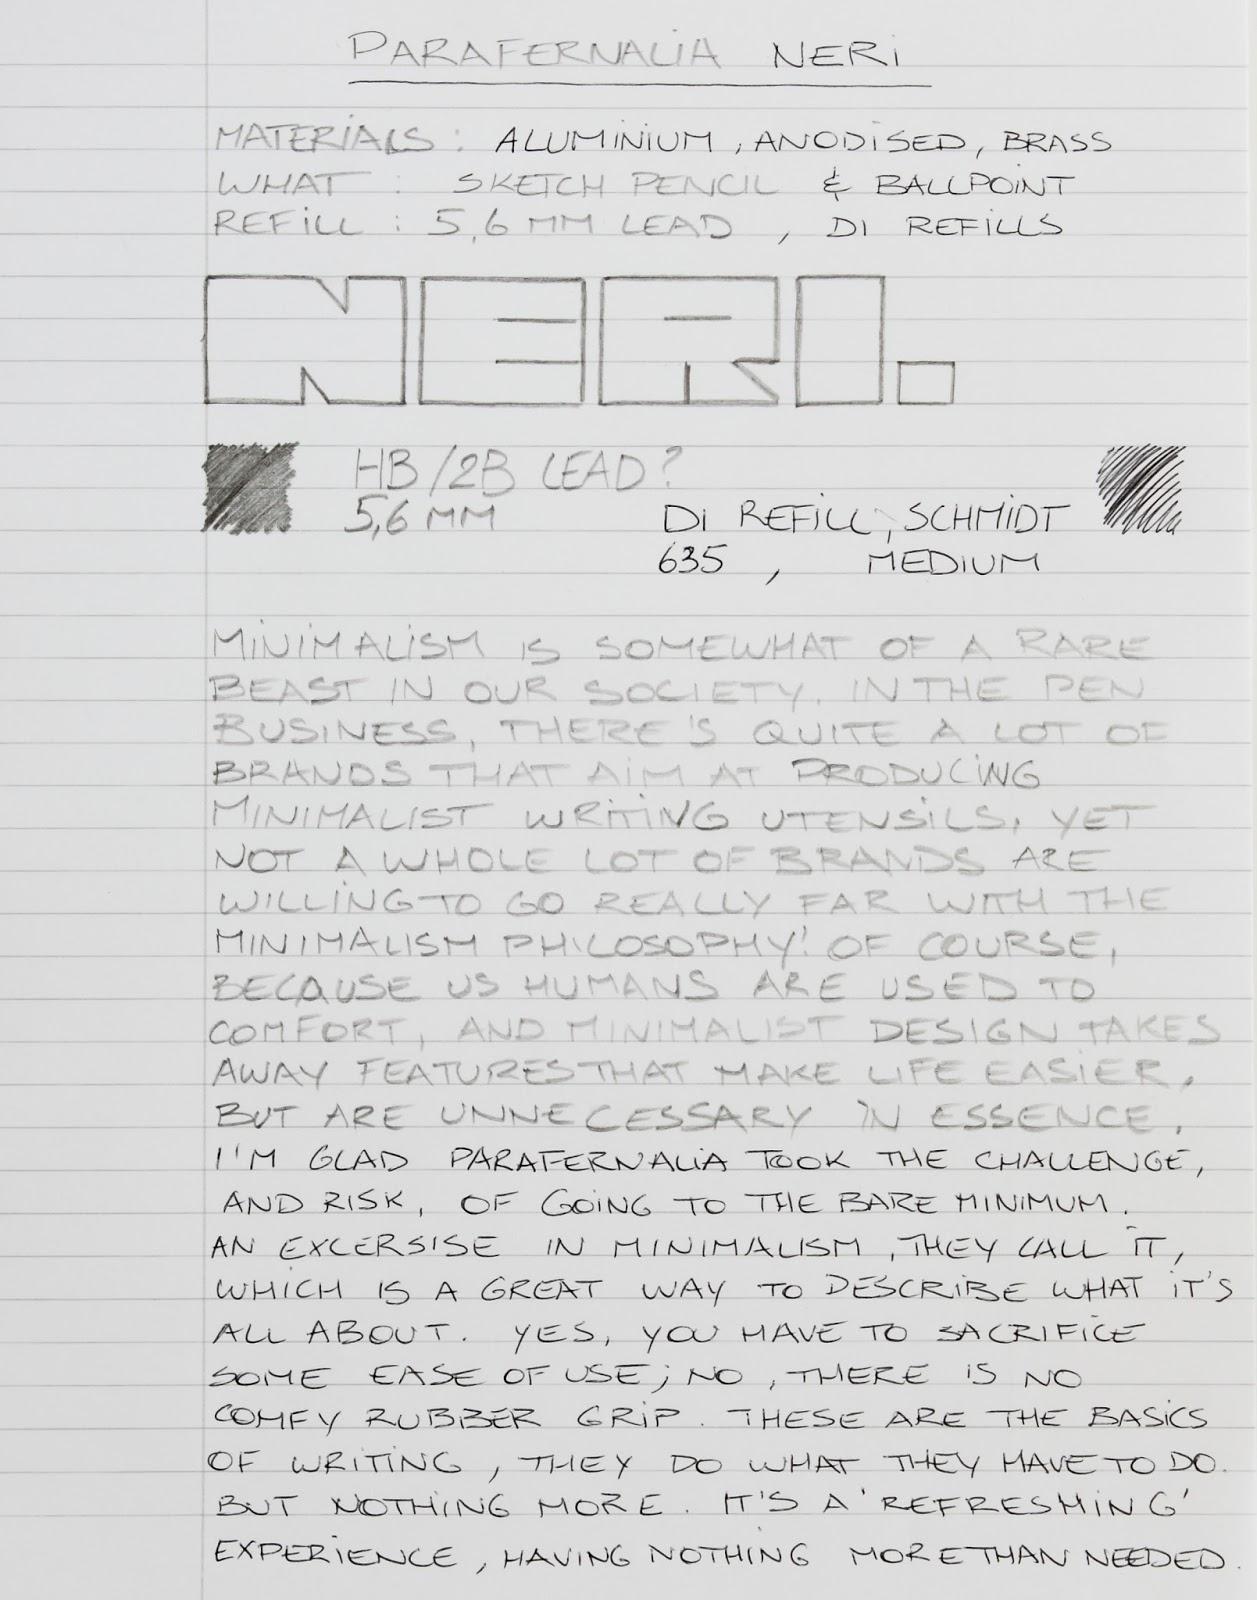 New In Box Italy Parafernalia Neri Anodized Black Ballpoint Pen